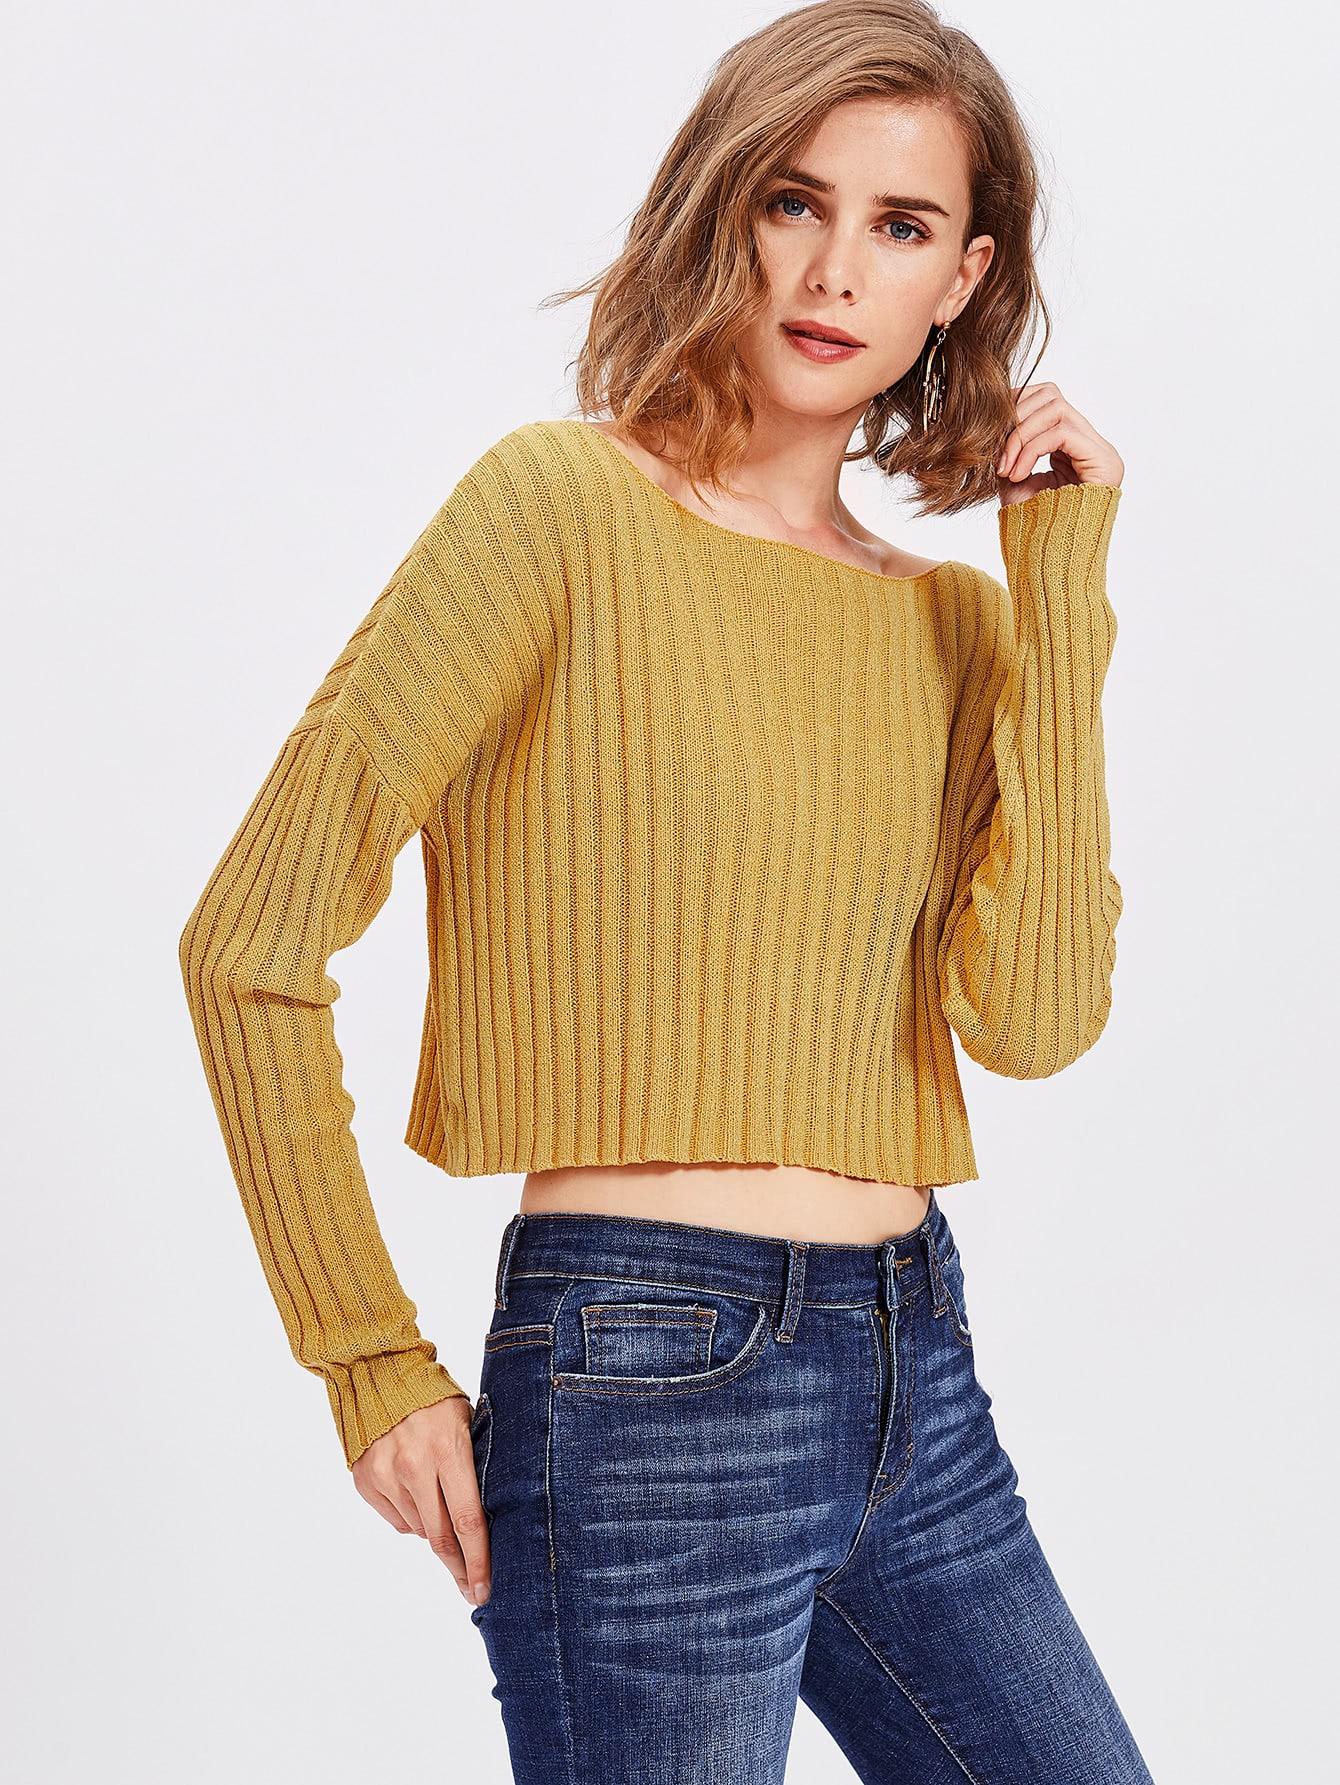 Drop Shoulder Rib Knit Crop Jumper sweater170720463